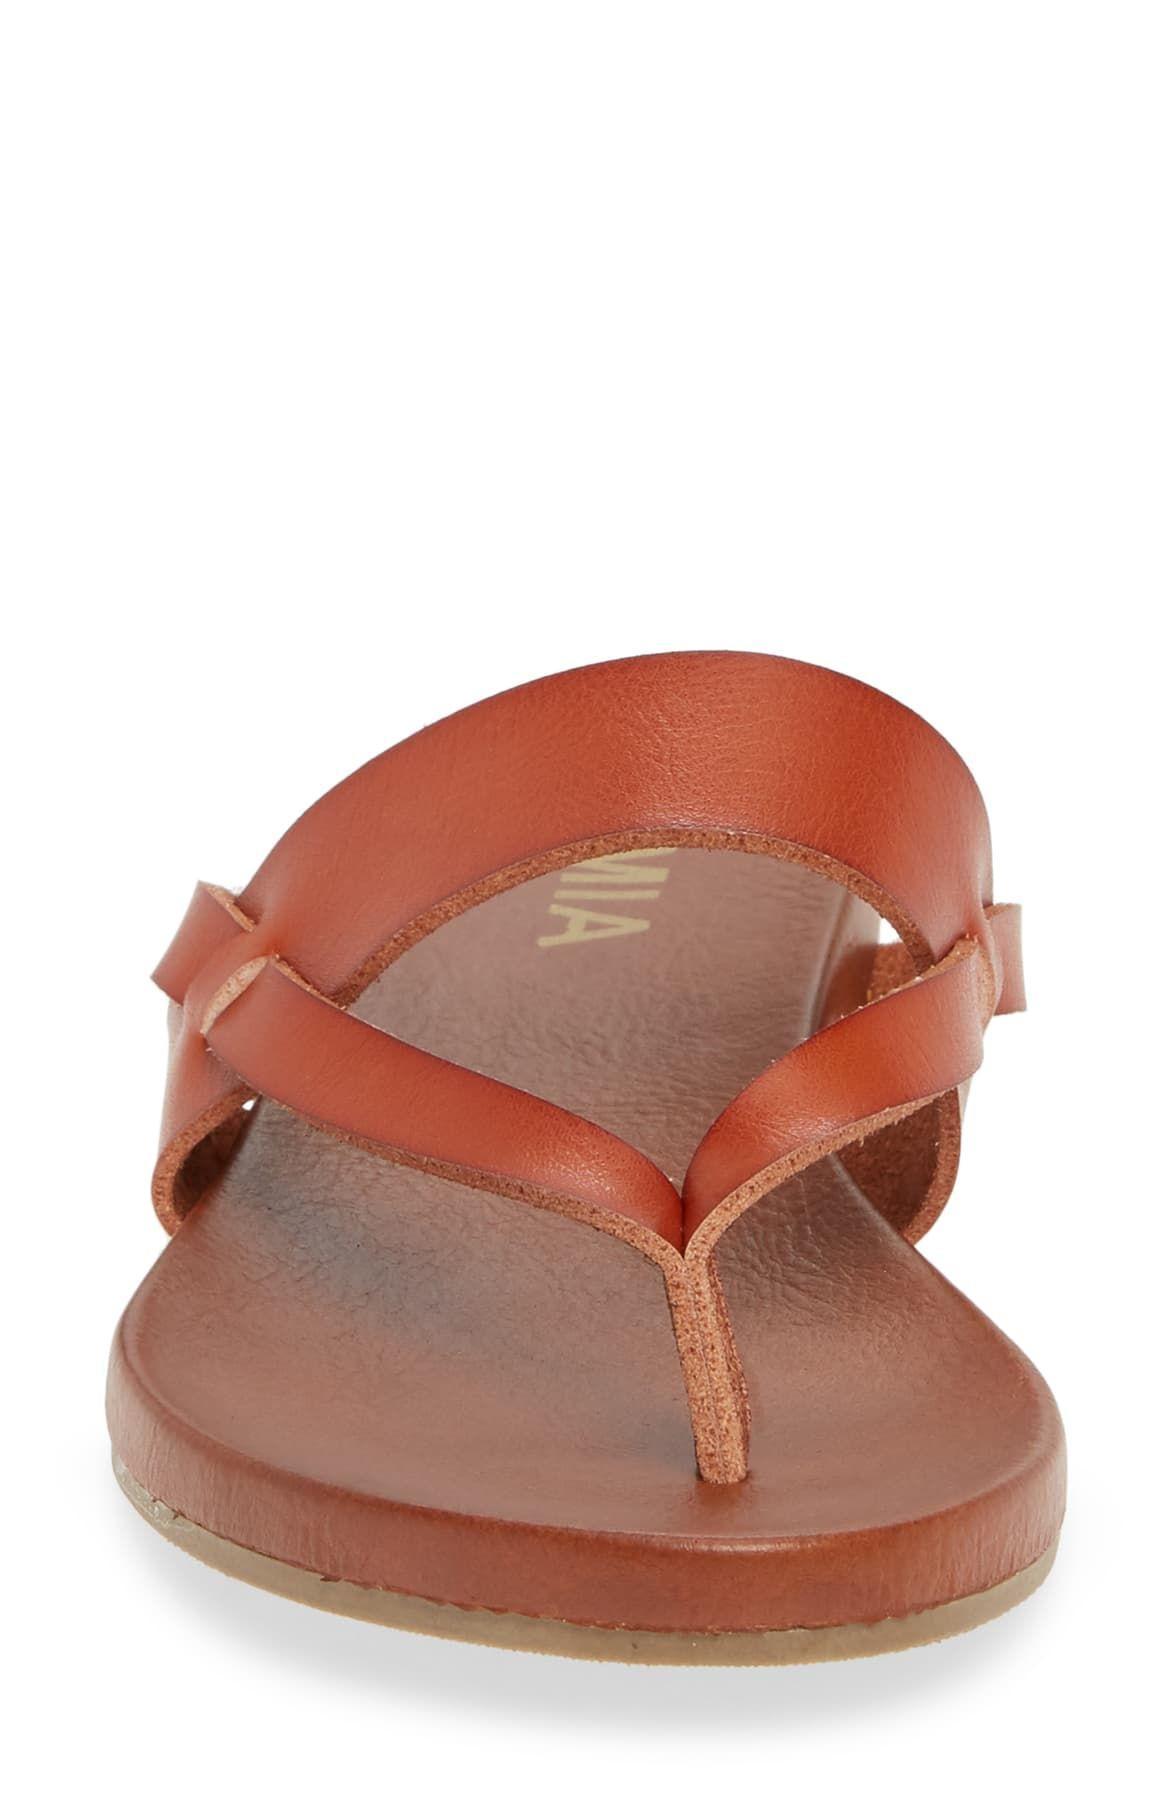 MIA Mariah Slide Sandal in Tan (Brown